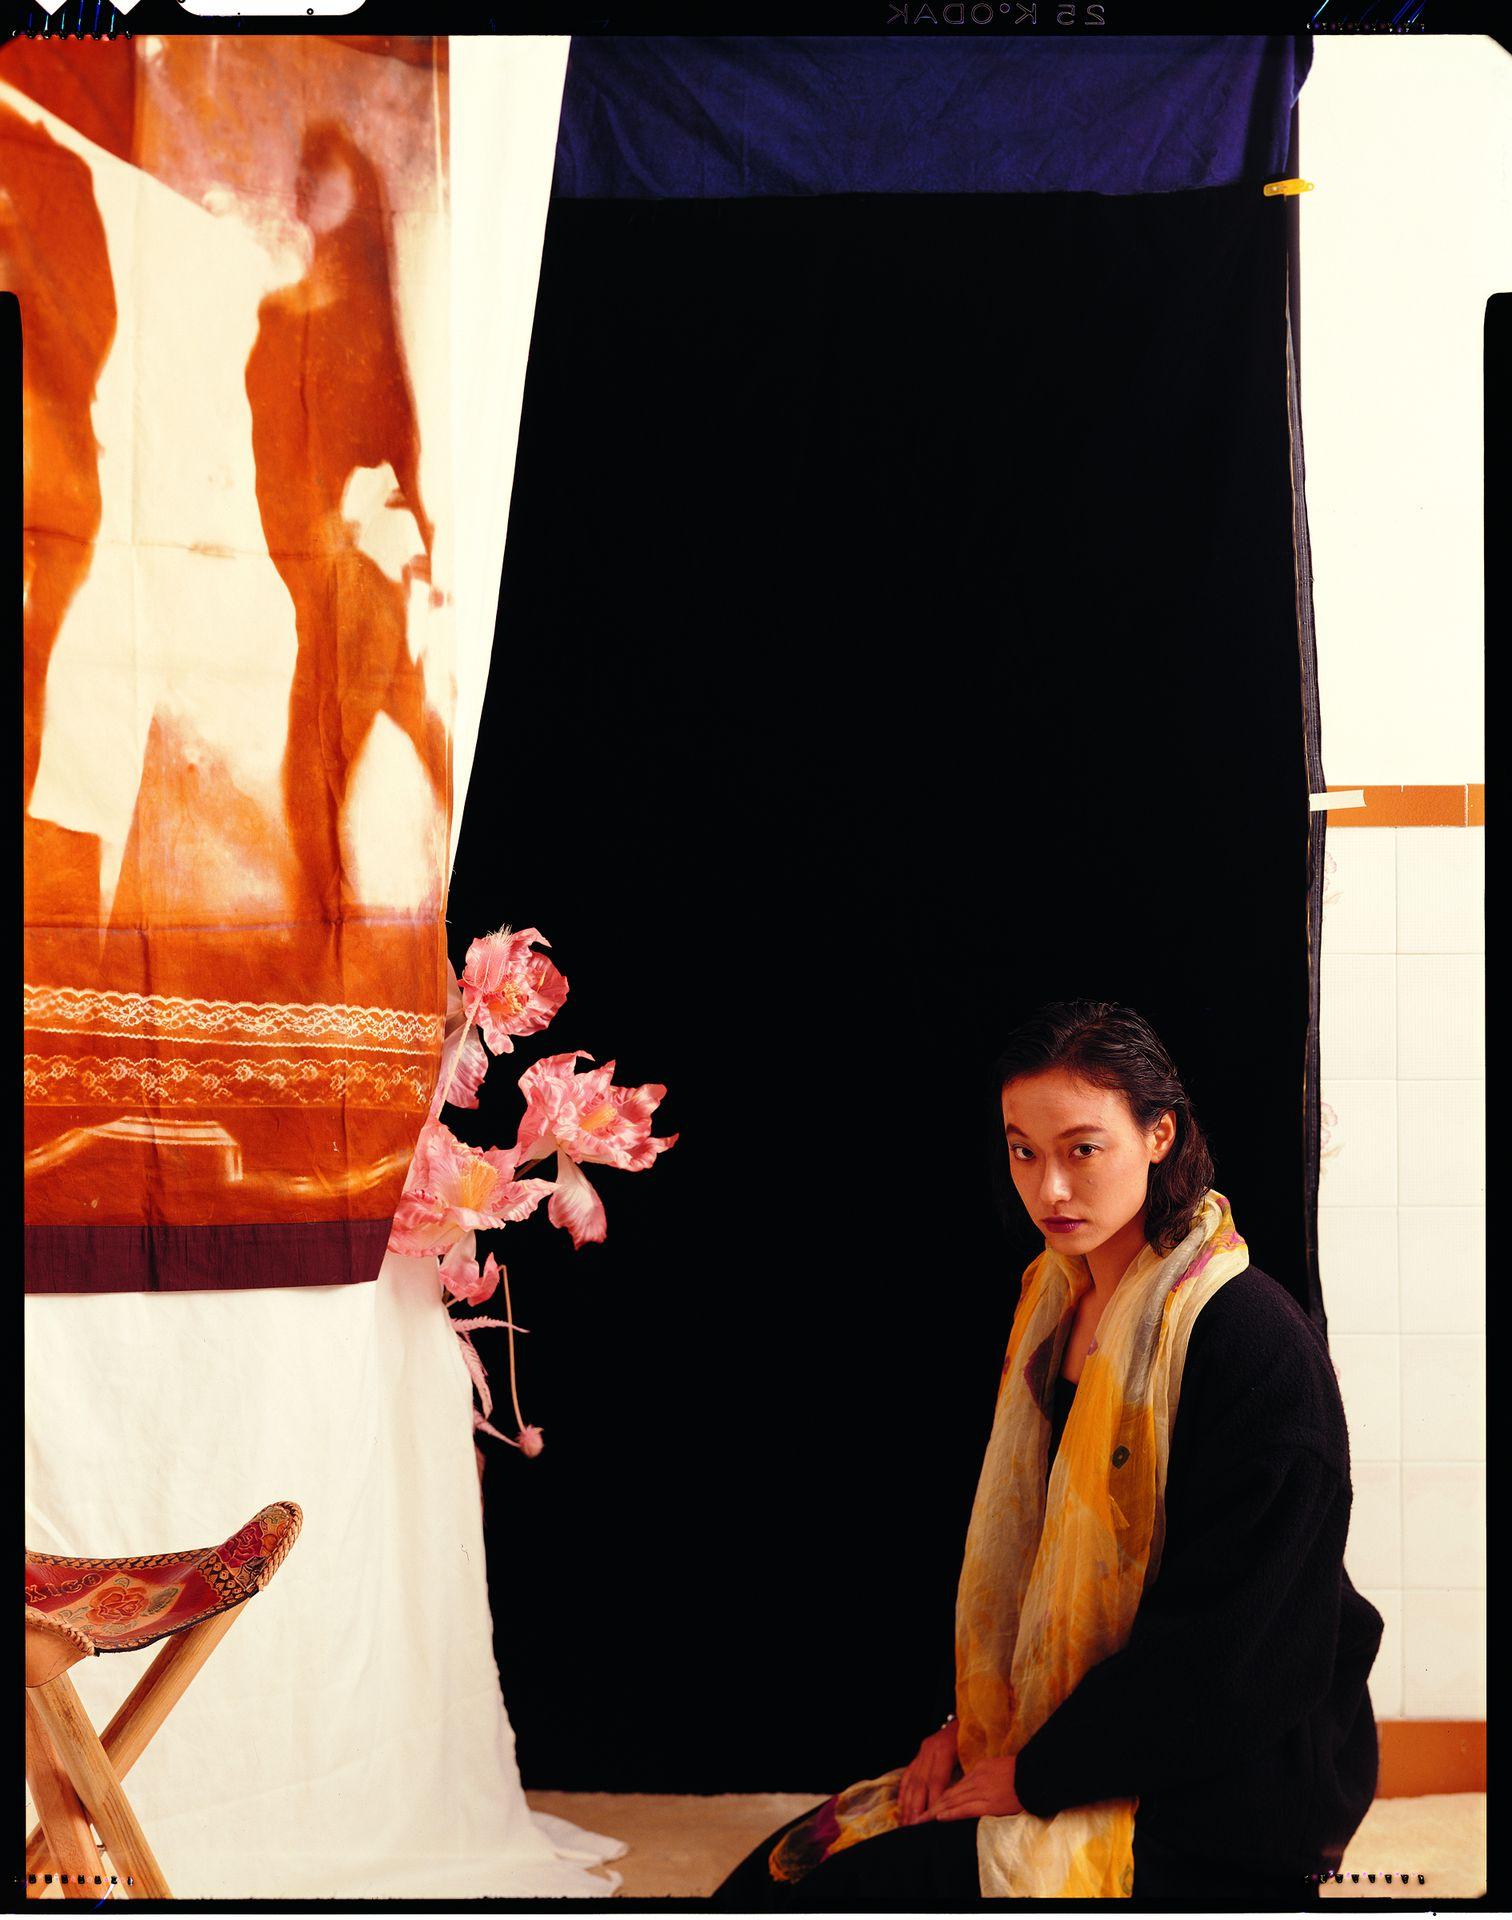 Jojo and Dancer, 1991